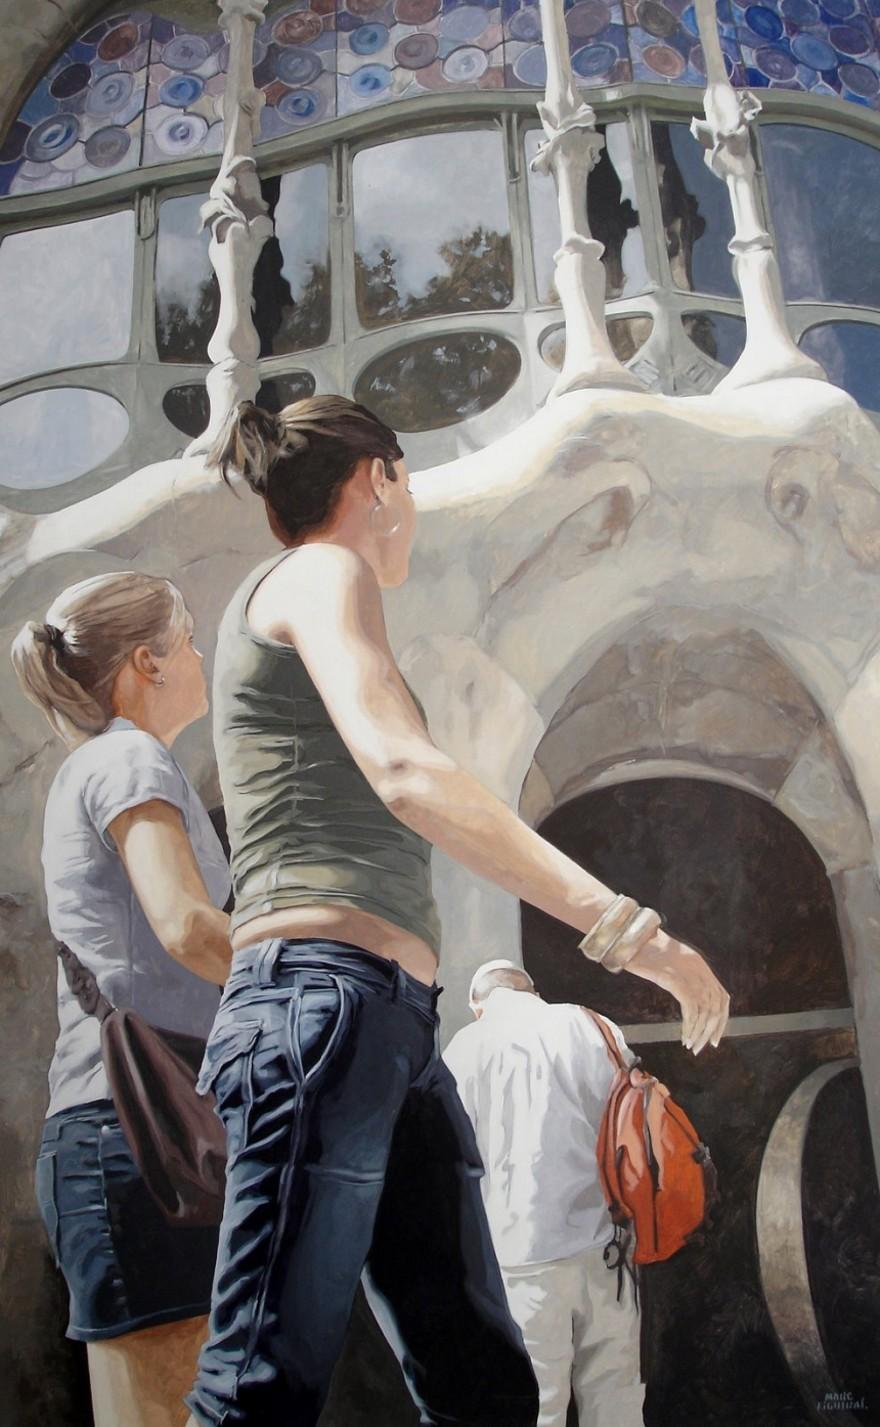 dipinti-iperrealisti-scorci-barcellona-passanti-marc-figueras-10